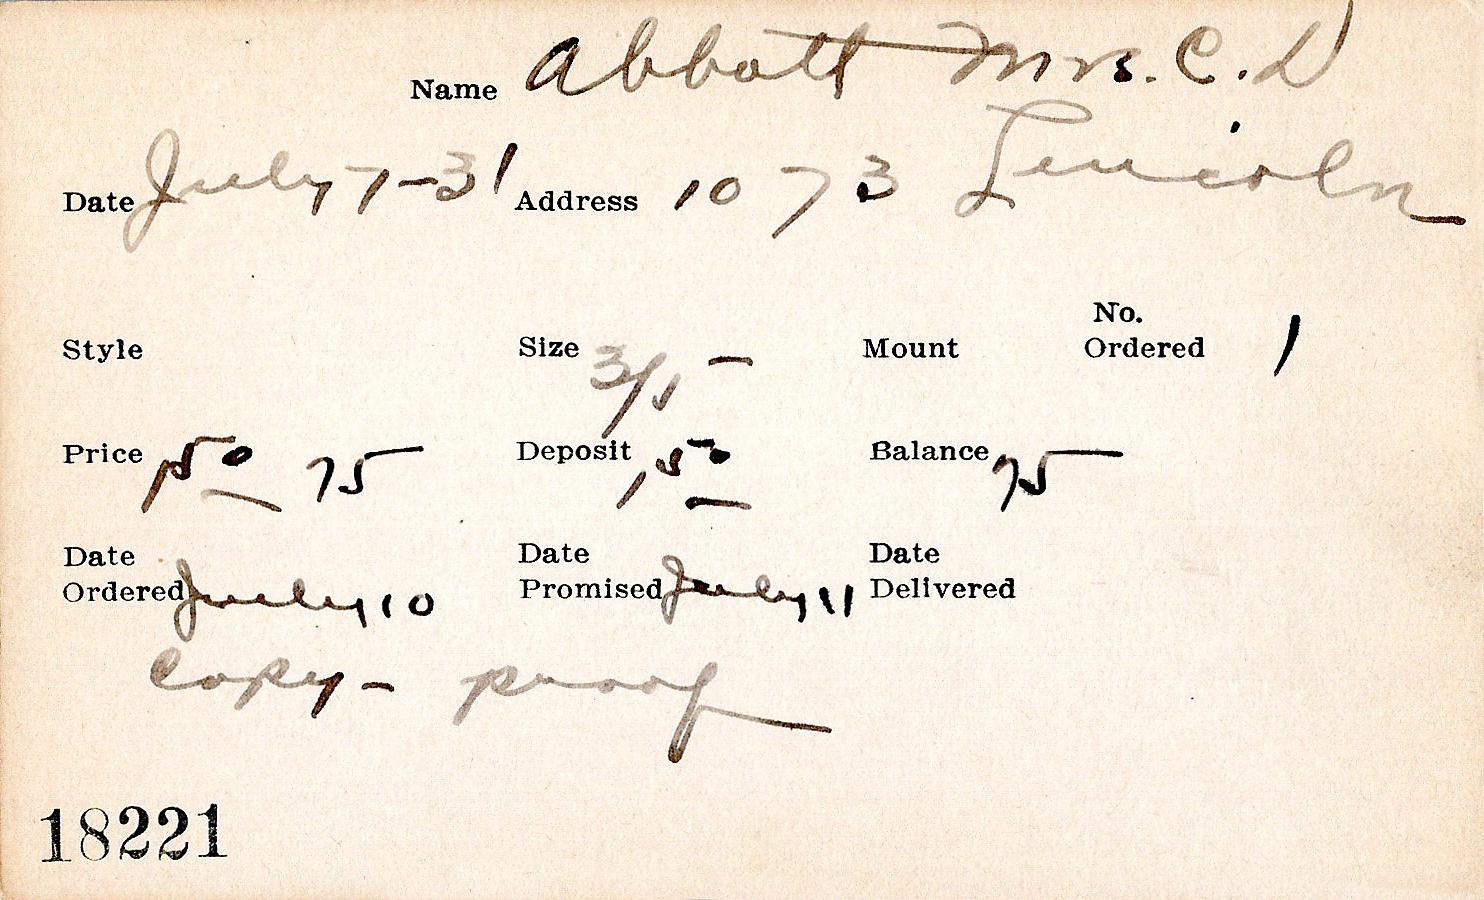 Index card for Mrs. C. D. Abbott